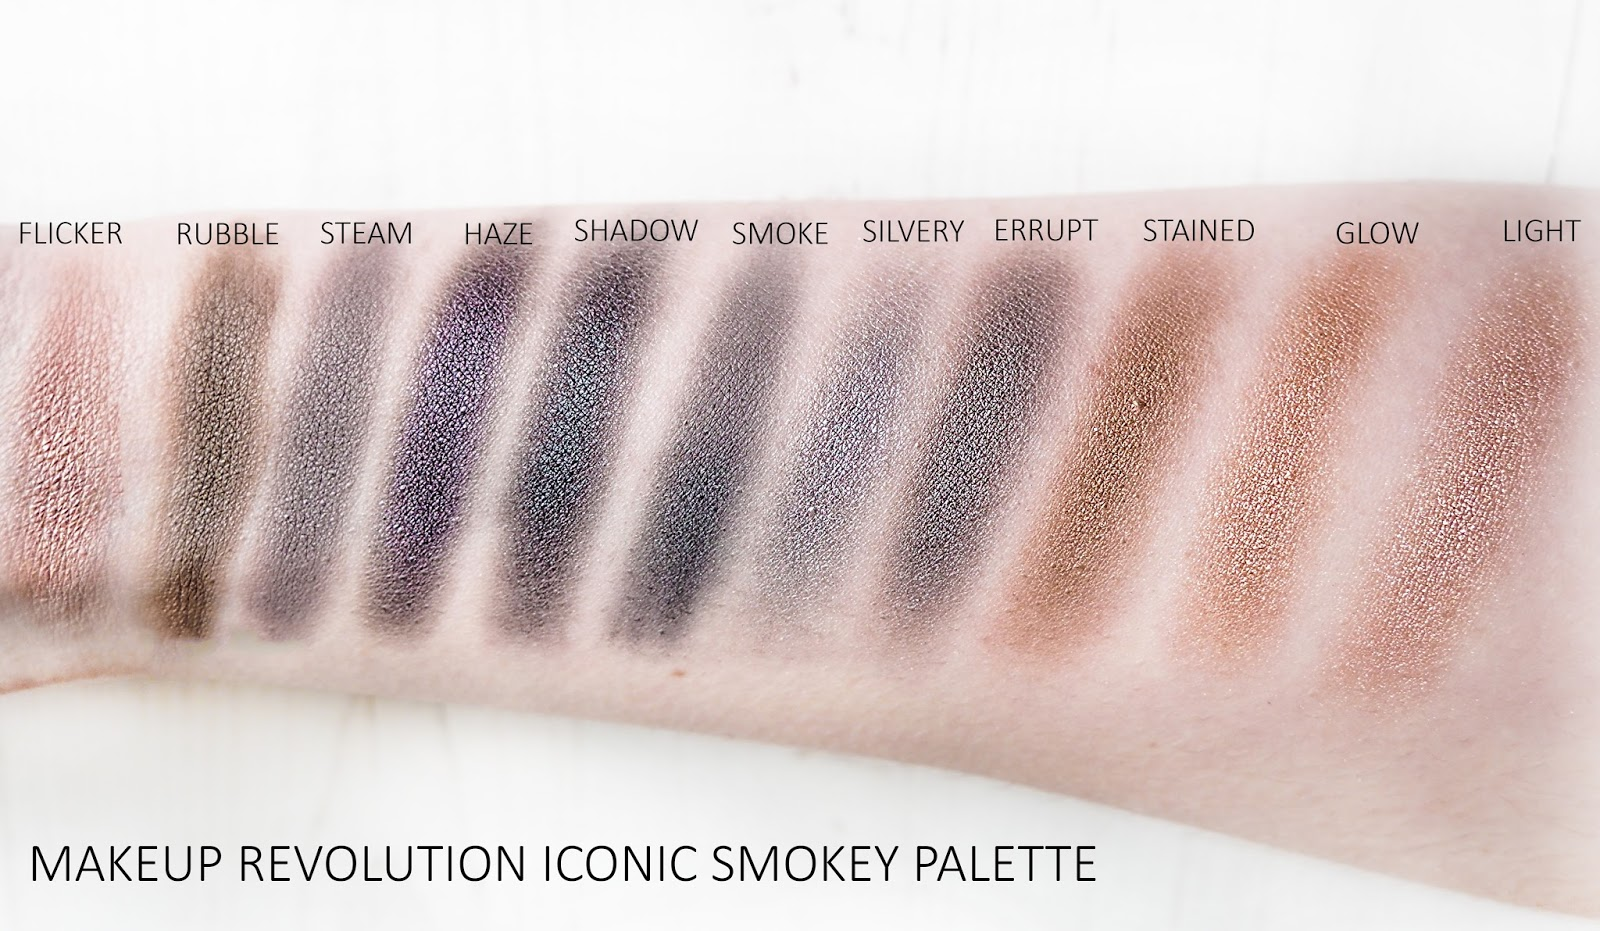 Makeup Revolution Iconic Smokey Palette Swatches